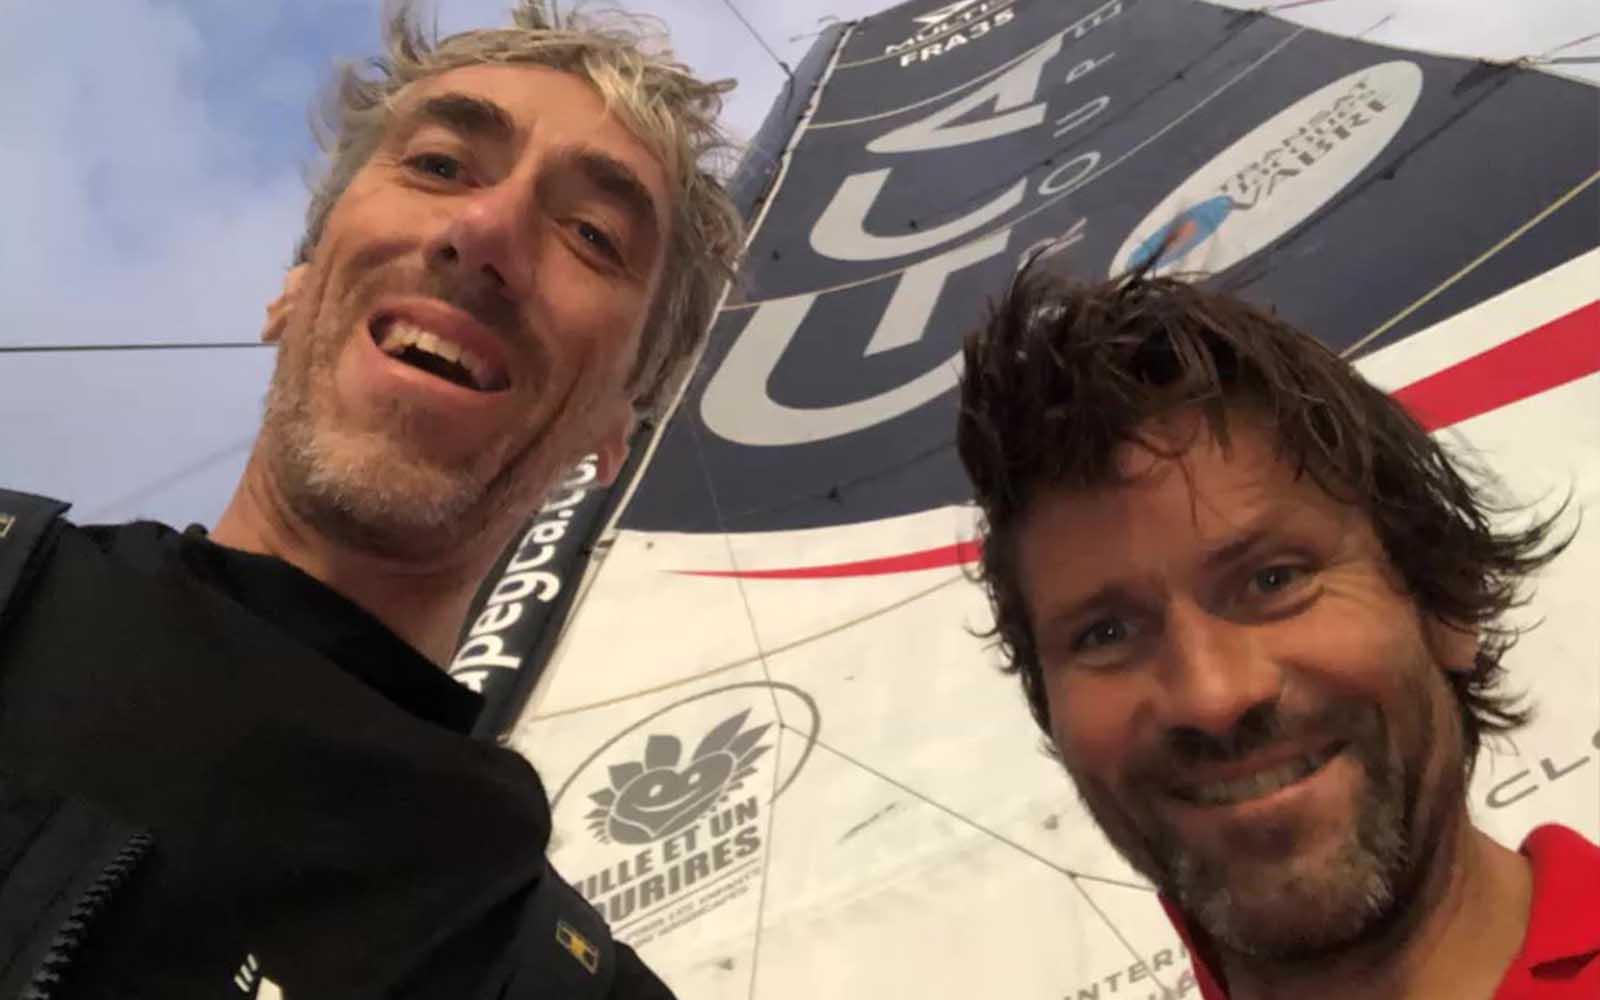 campeão da Transat Jacques Vabre - boat shopping